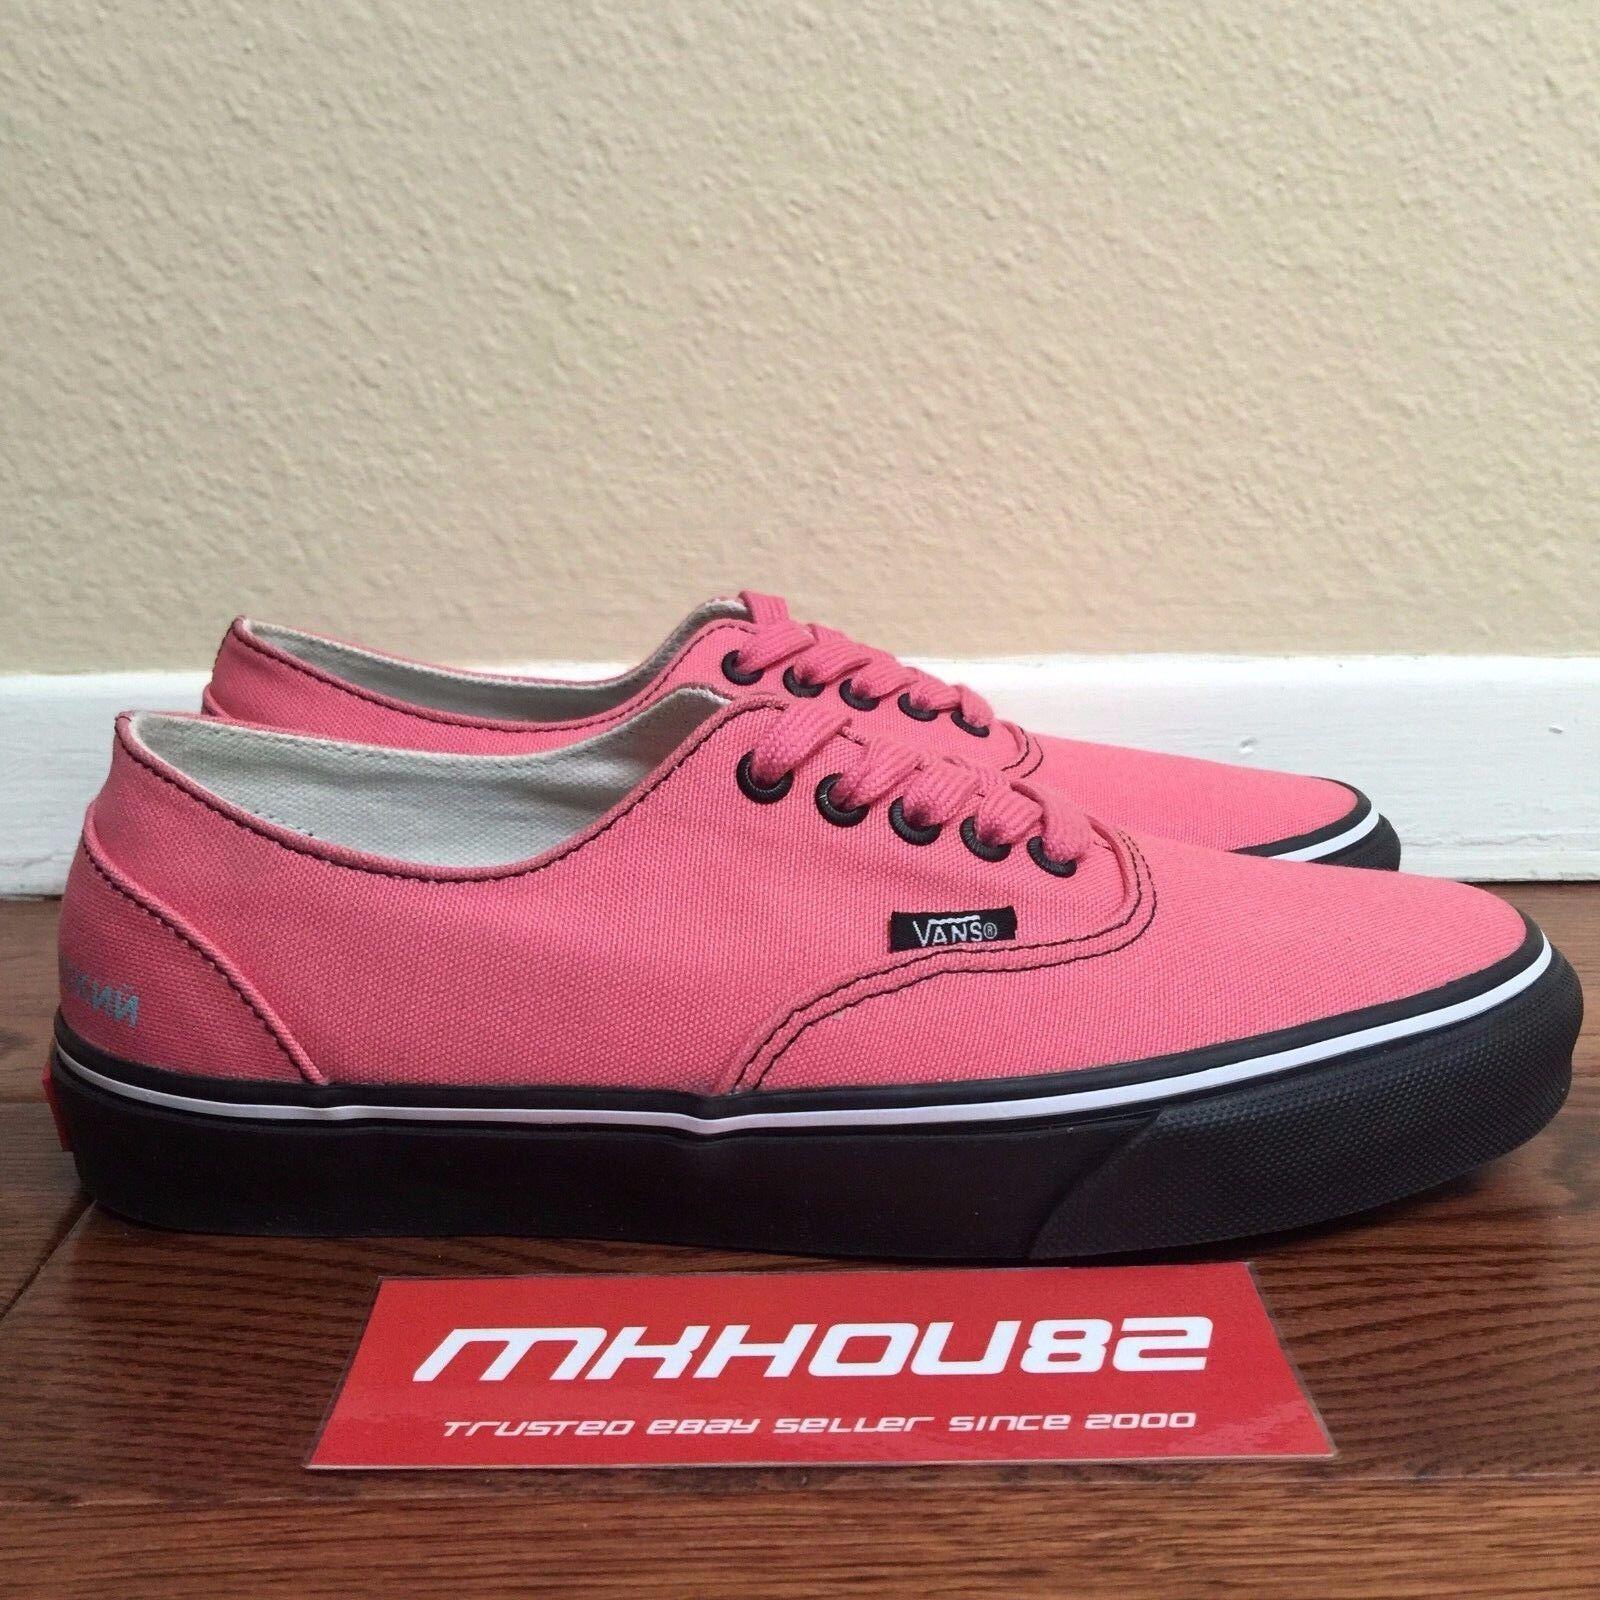 c18702c7c5 Gosha Rubchinskiy X VANS Vault Era Decon Shoes Pink Size 7.5 Men 9 ...